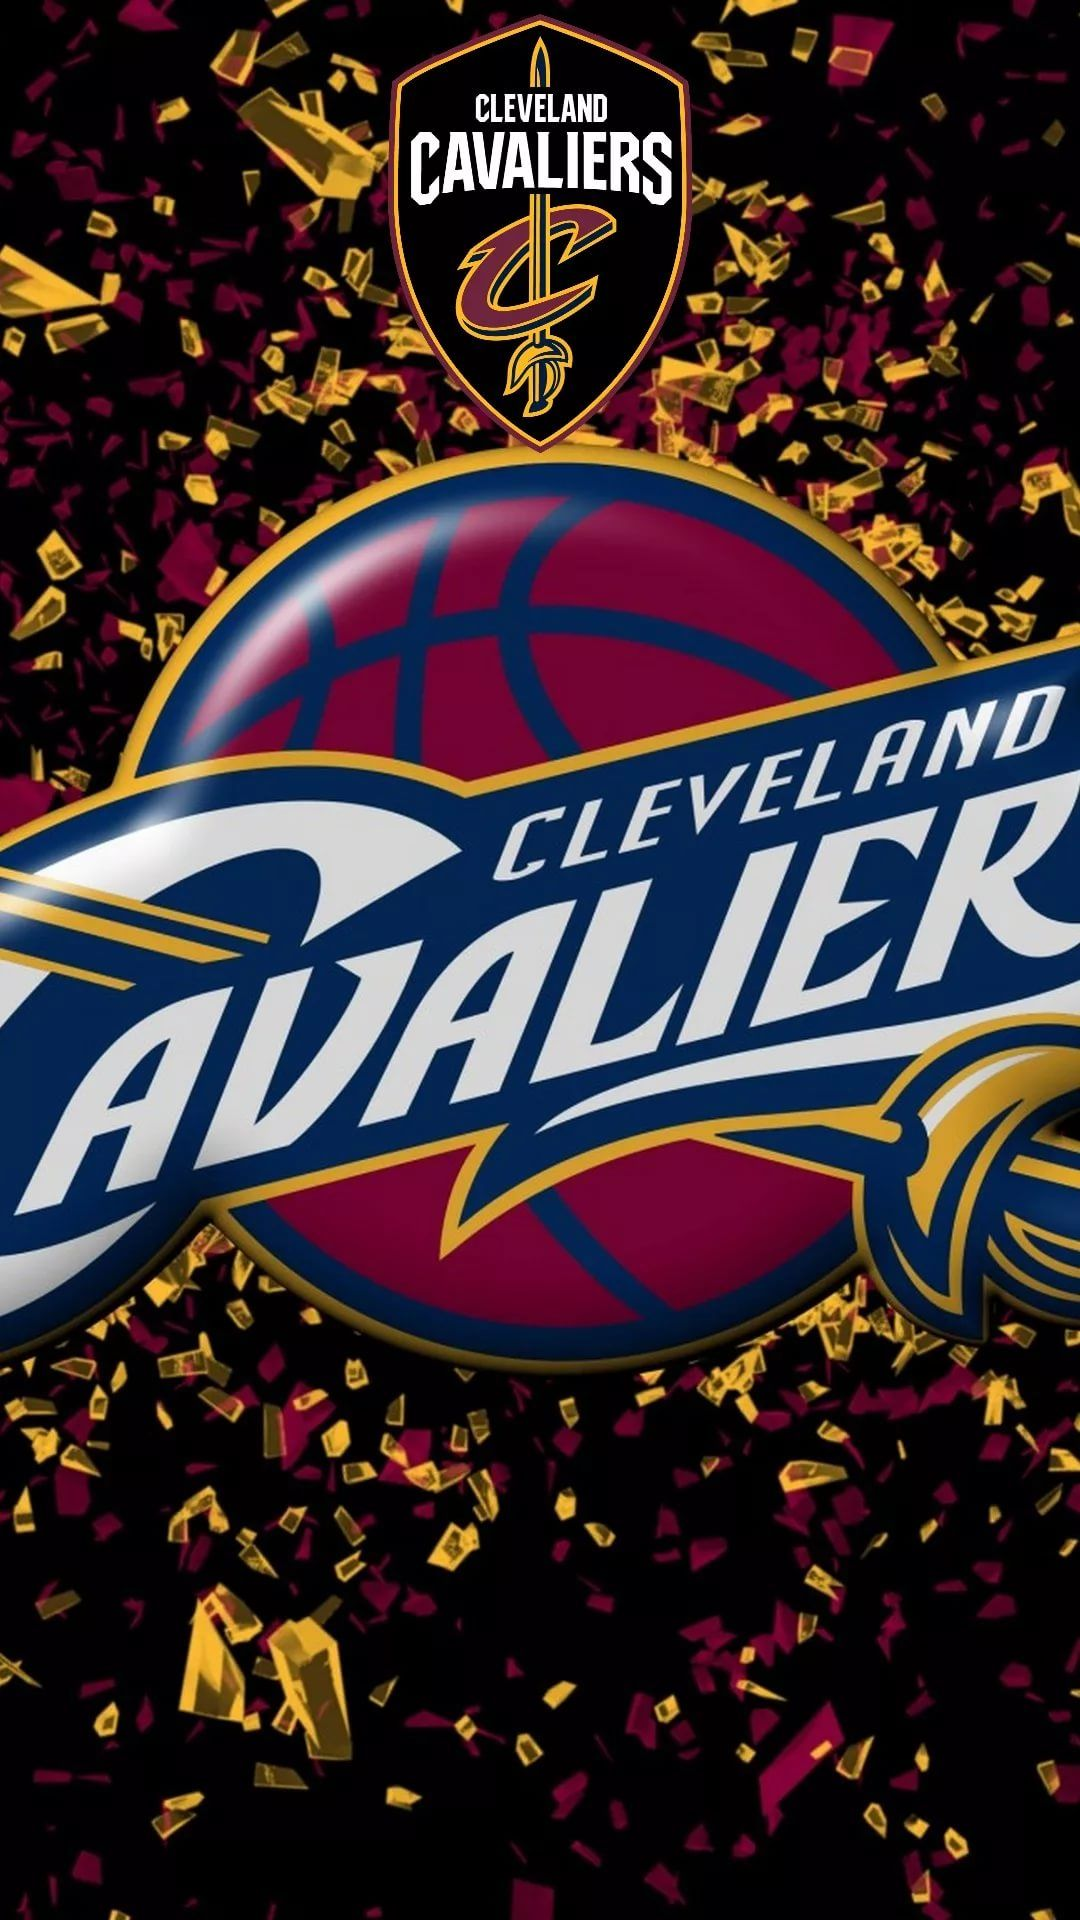 Cleveland Hd iPhone wallpaper